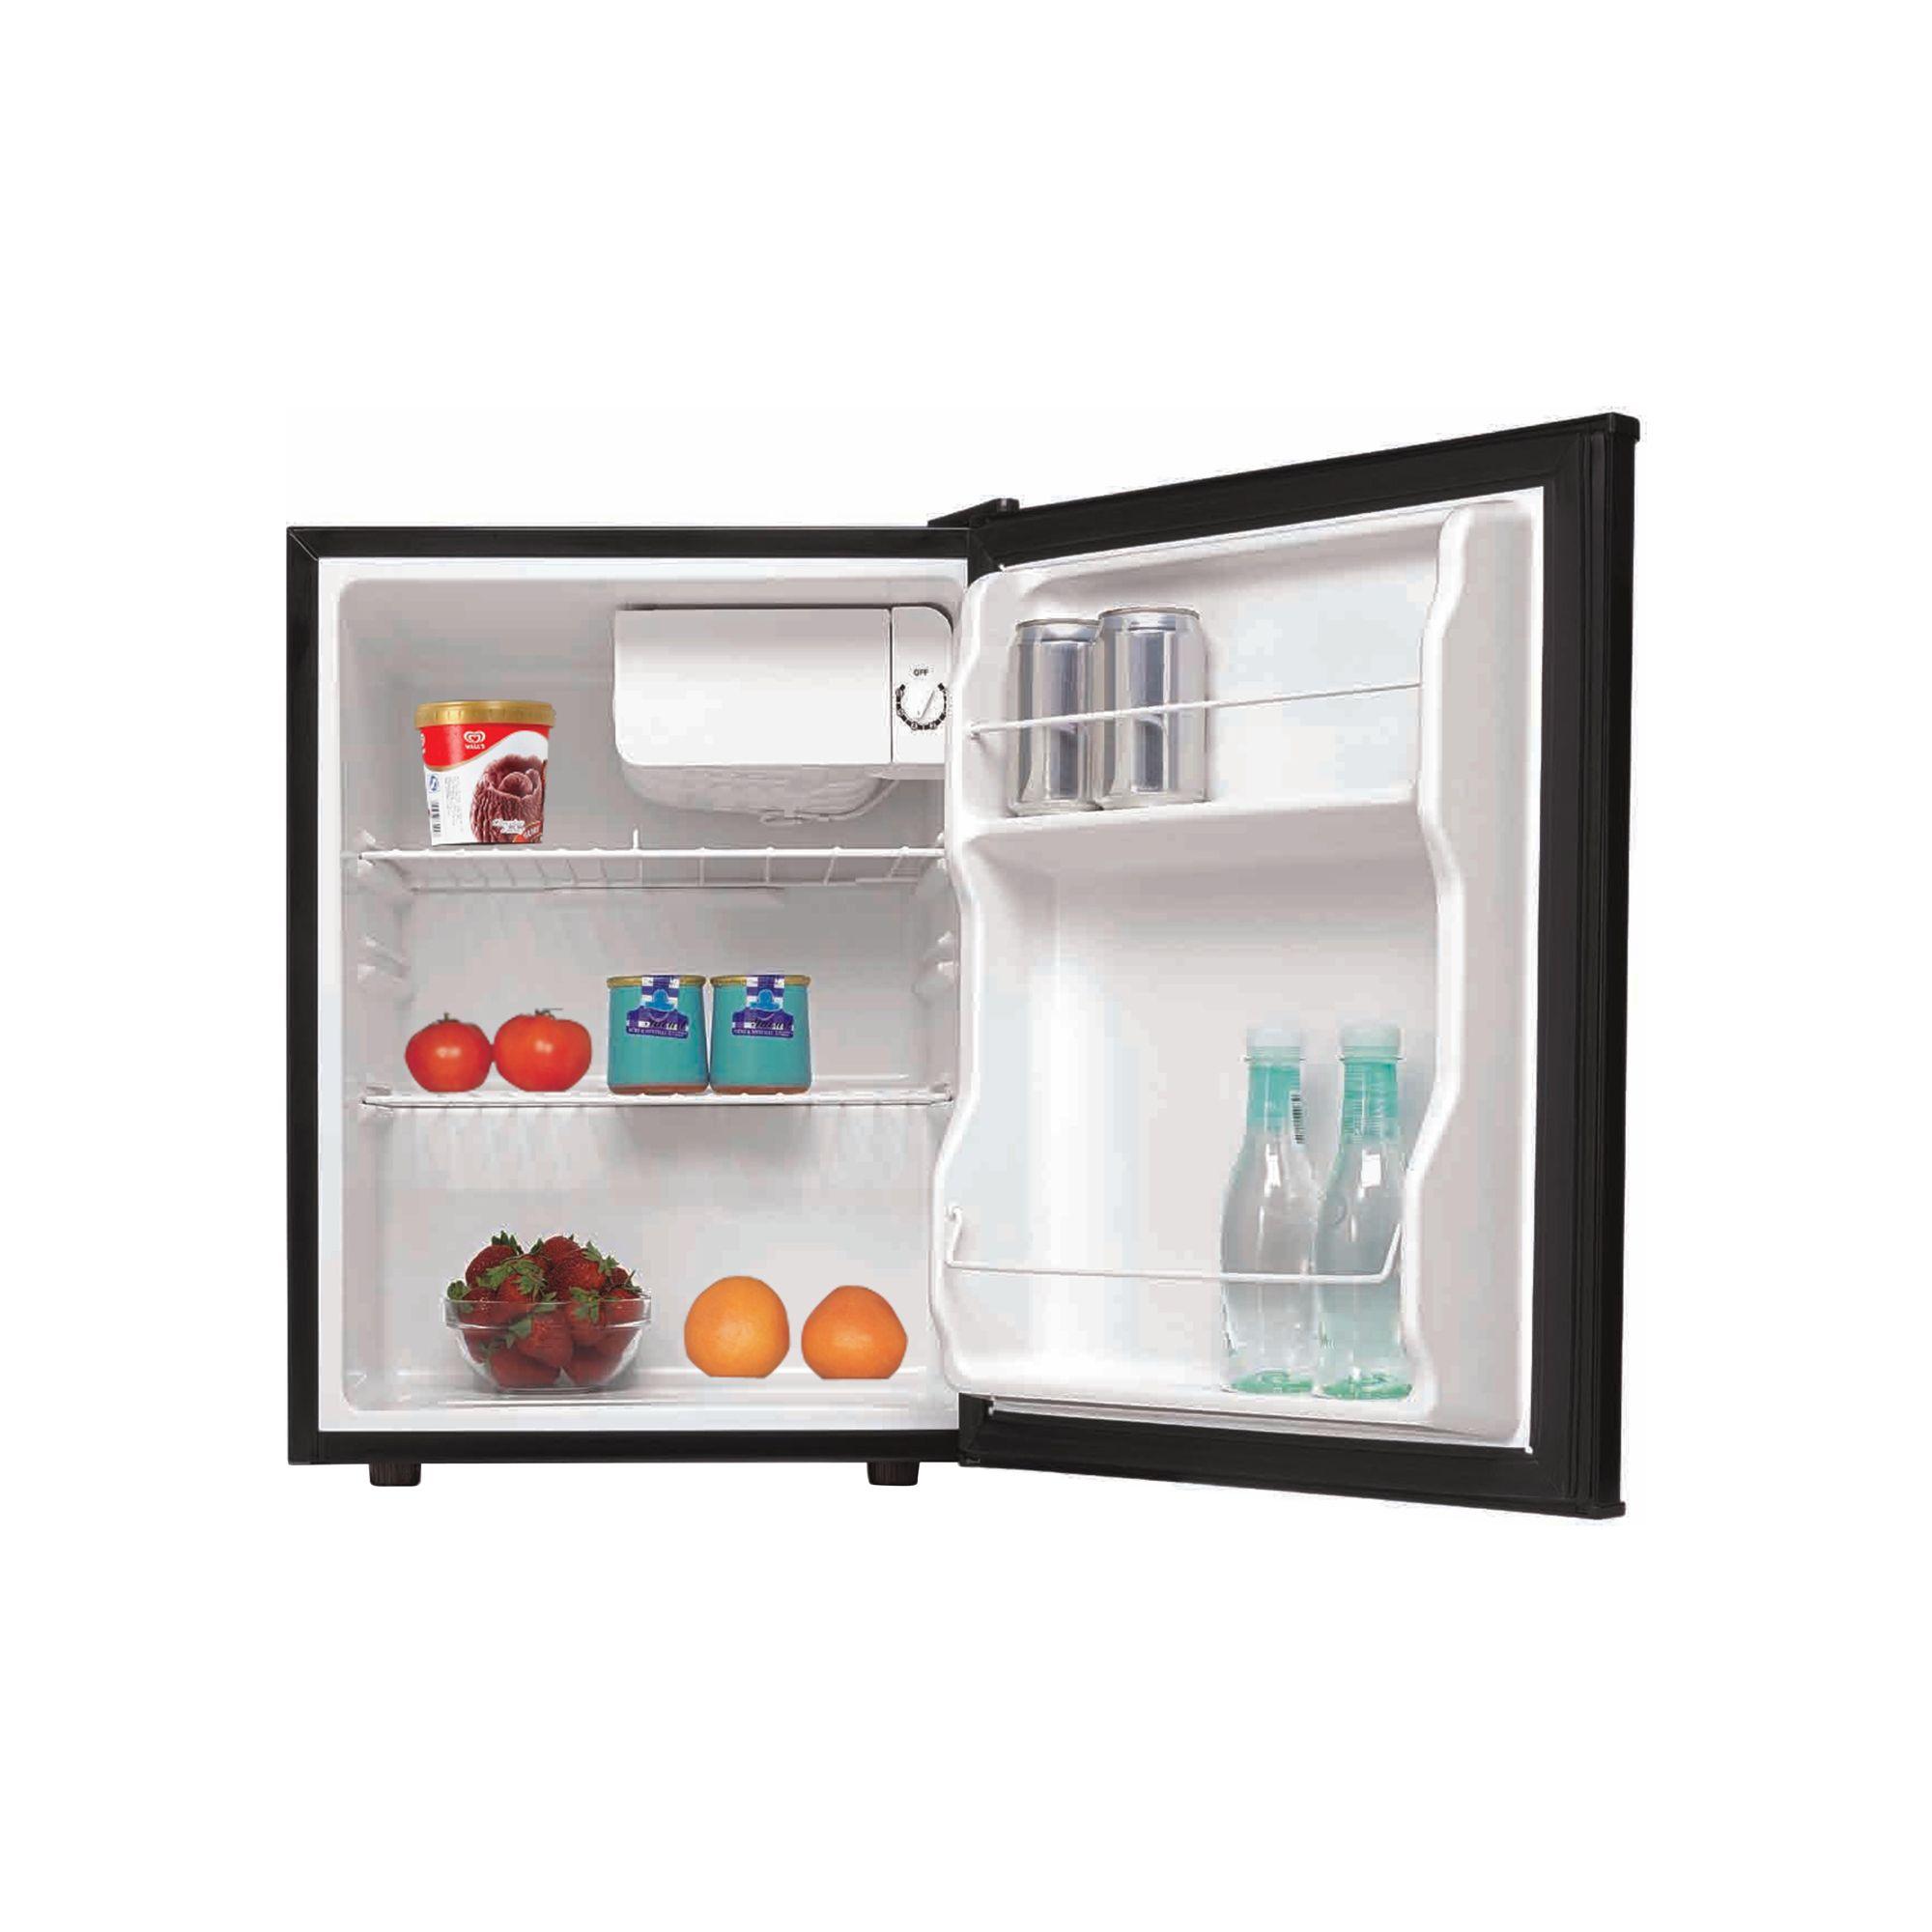 Kenmore 2.4 cu. ft. Compact Refrigerator